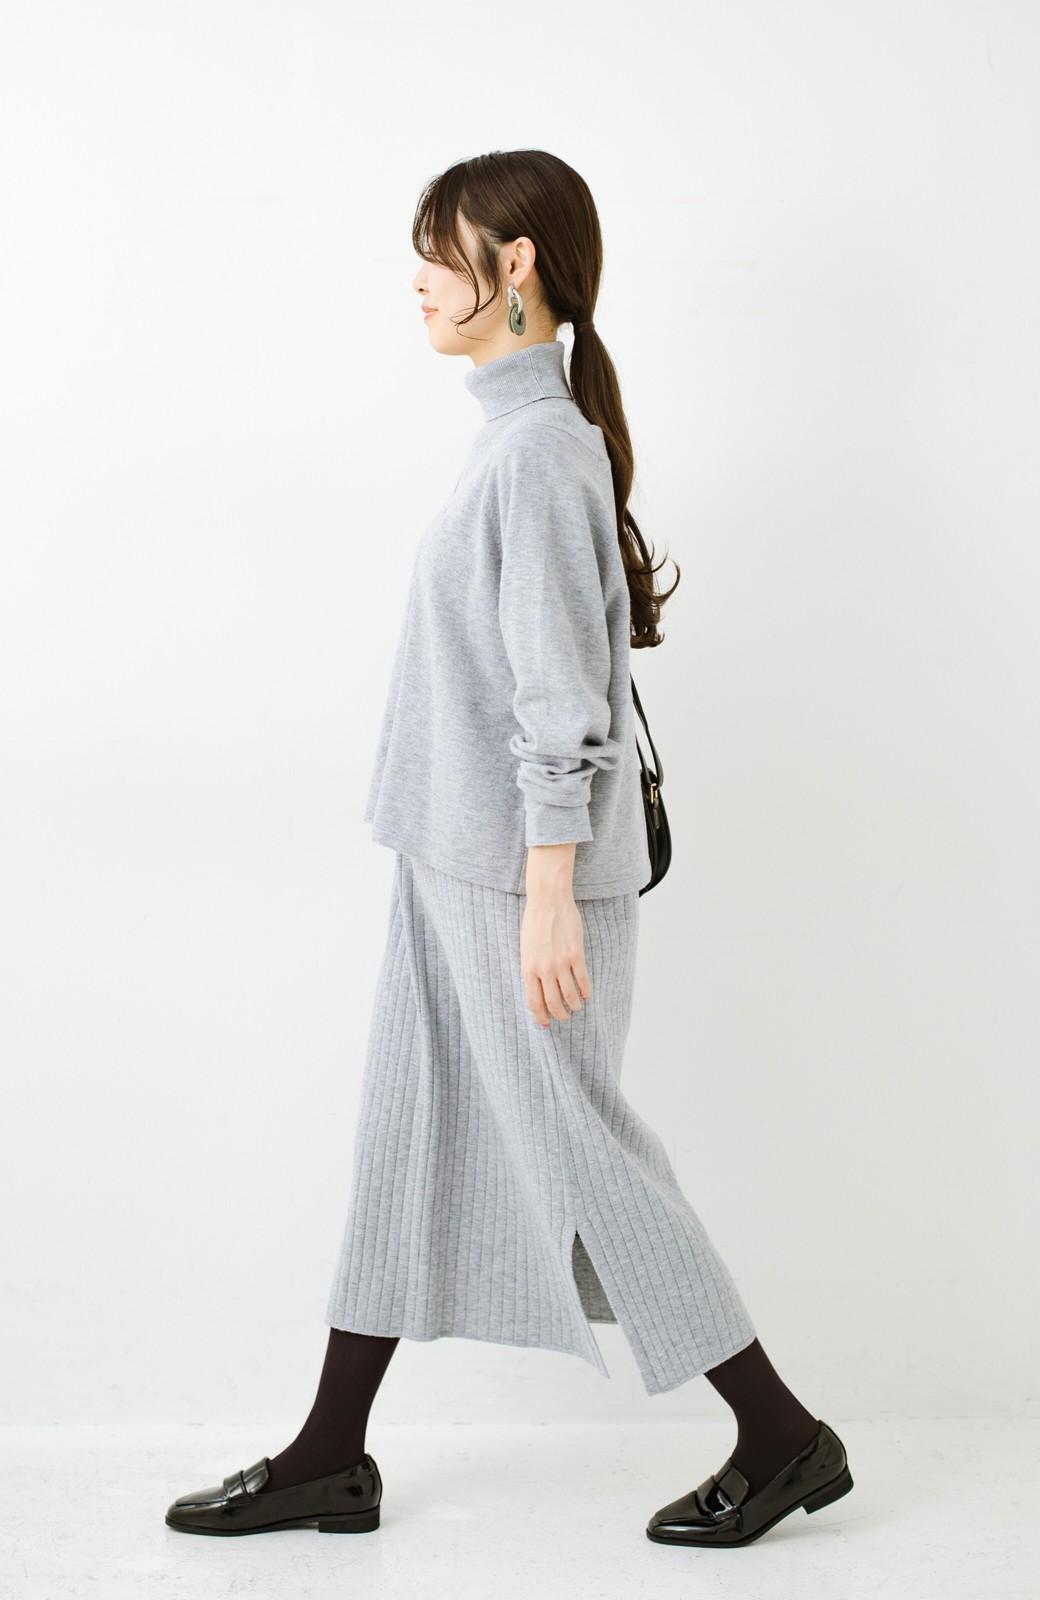 haco! セットで着るだけパッとかわいい ニットトップス&ノースリーブニットワンピースセット <グレー>の商品写真9